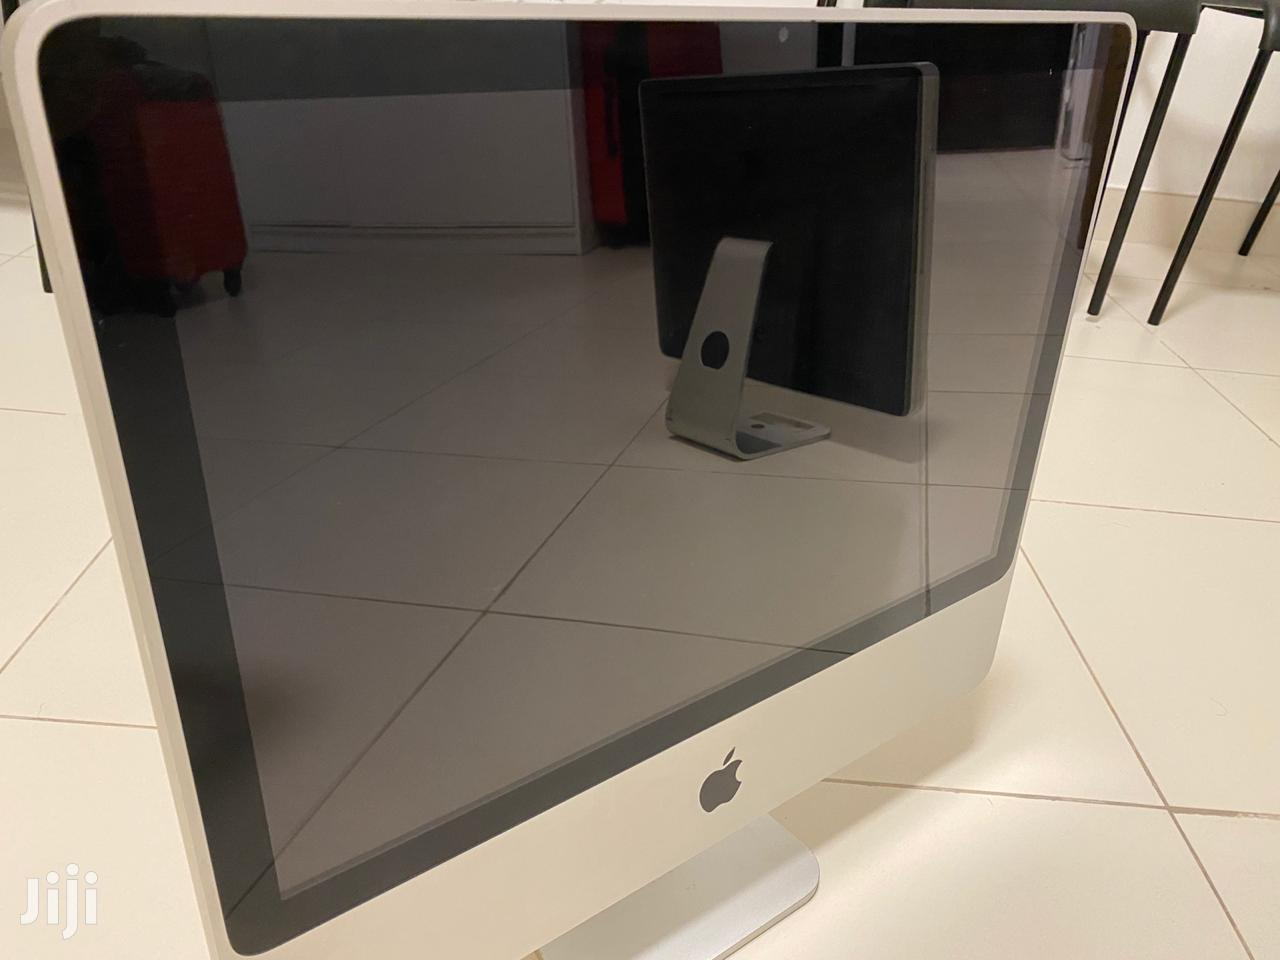 Archive: Desktop Computer Apple iMac 4GB Intel Core 2 Duo HDD 500GB